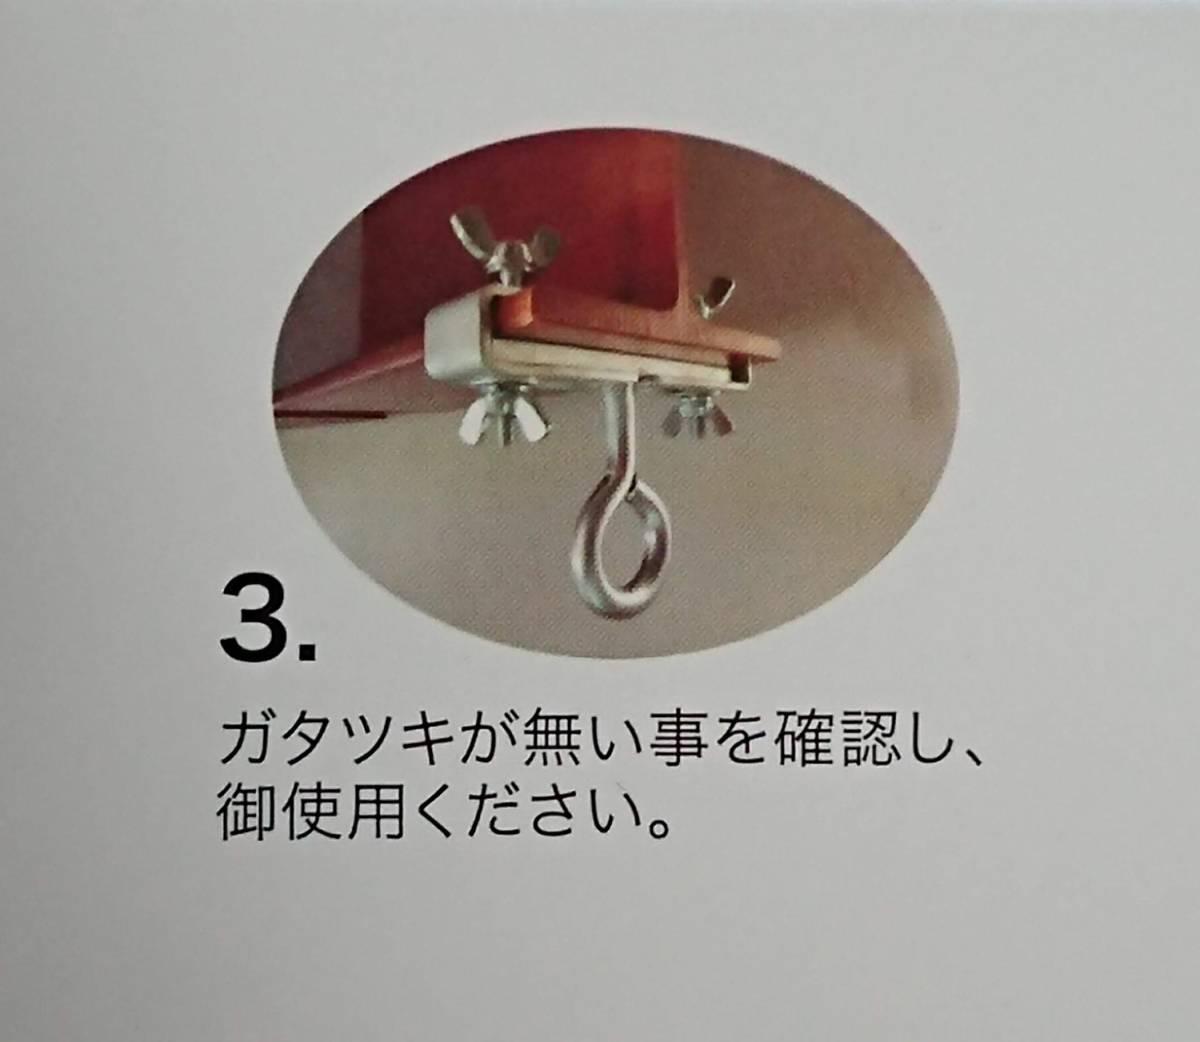 H鋼吊る~す(小) H鋼吊り金具 H鋼吊るす ヒートン_画像4